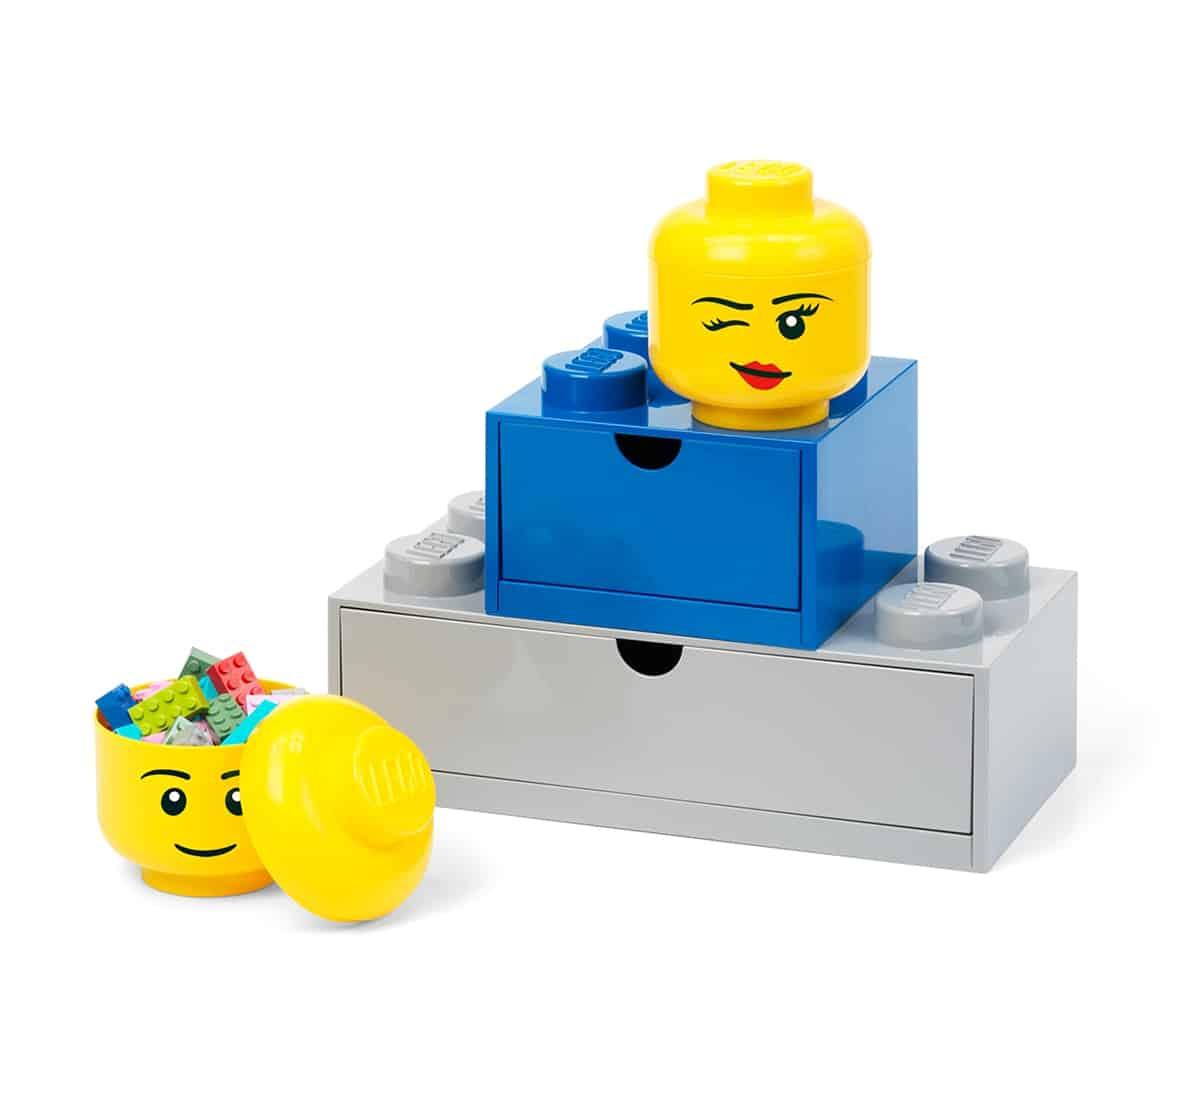 lego 5006211 oppbevaringshode liten storrelse blunkende